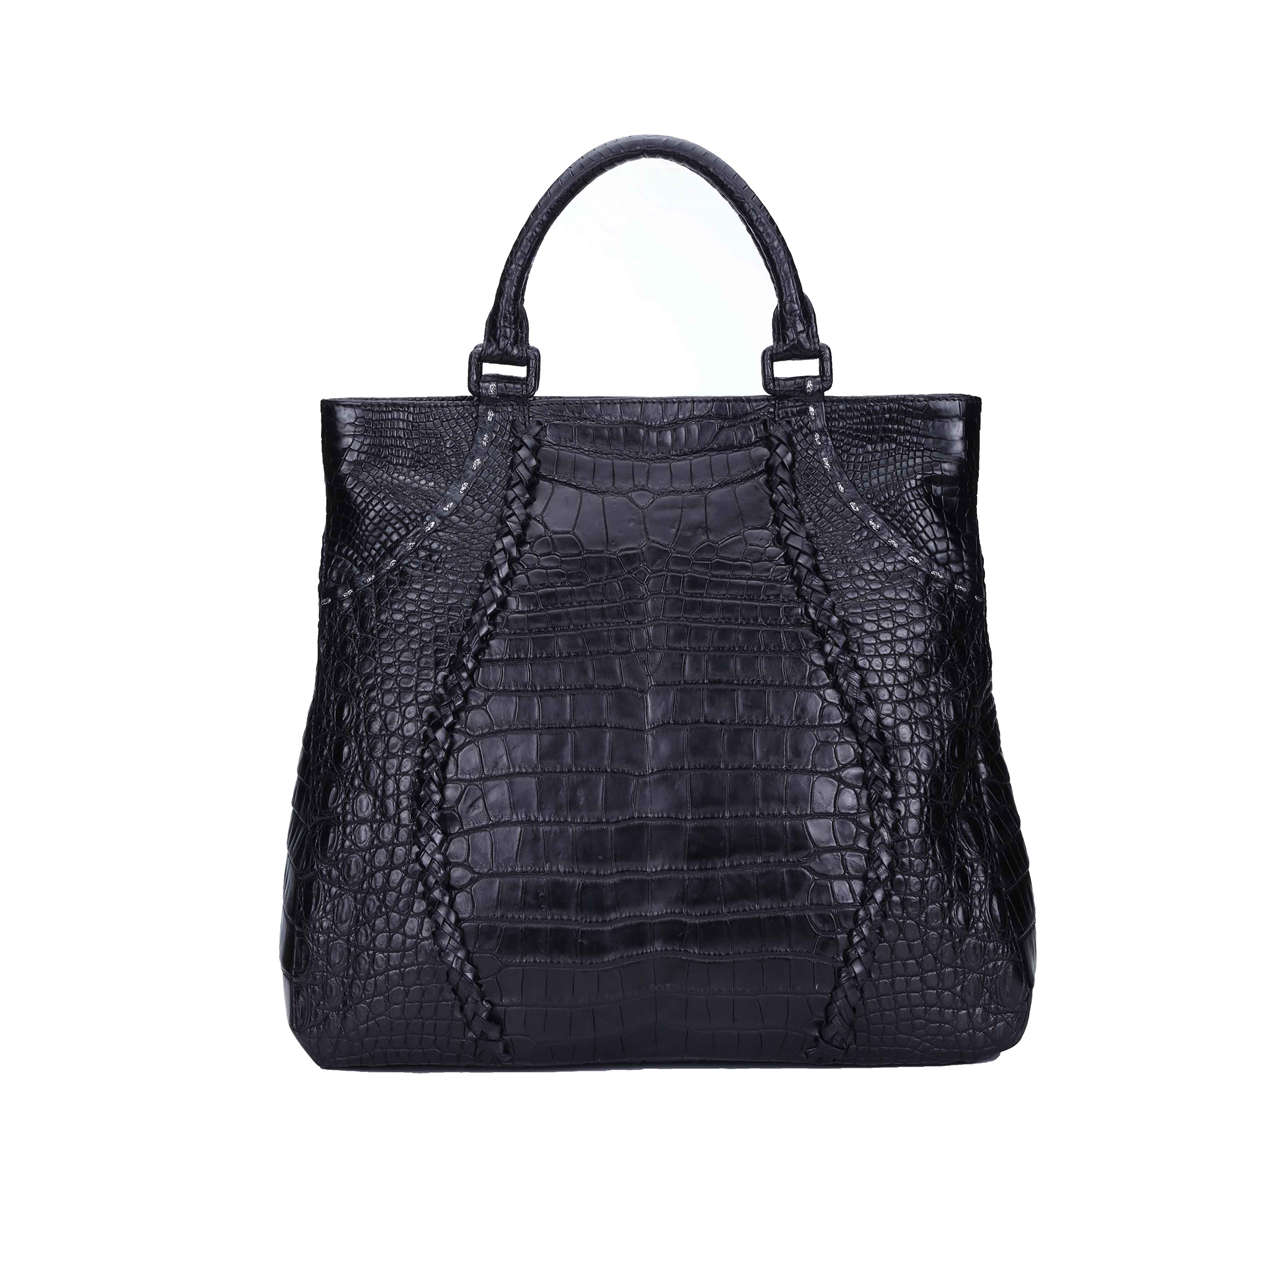 GF bags-Custom Latest Handbags Manufacturer, Cheap Handbags Online | Handbag-1